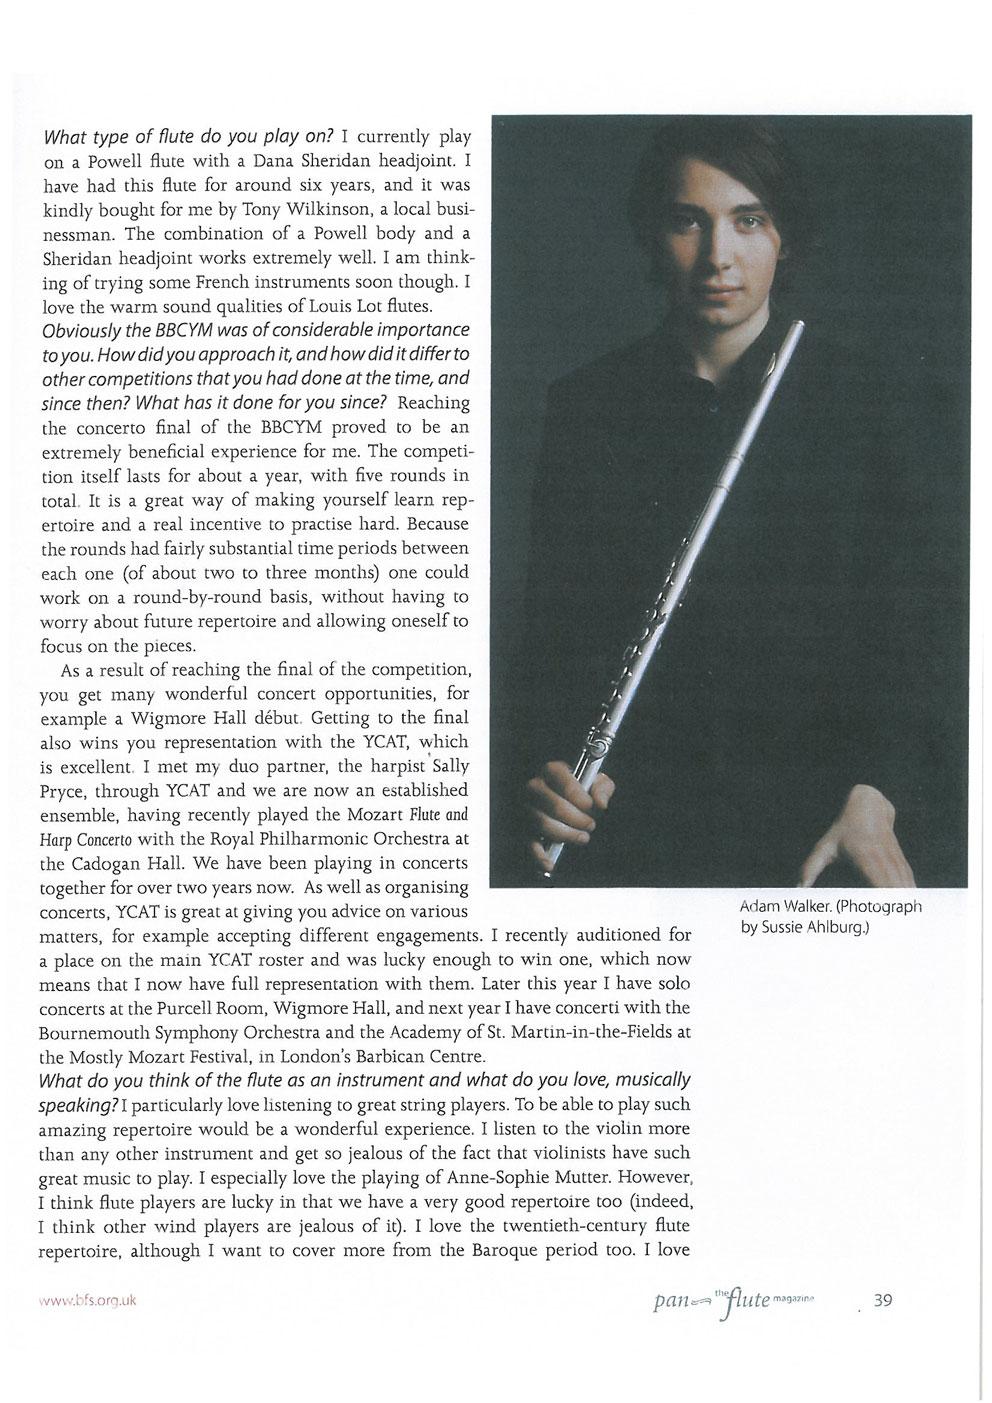 Interview, 2007, Pan, p3